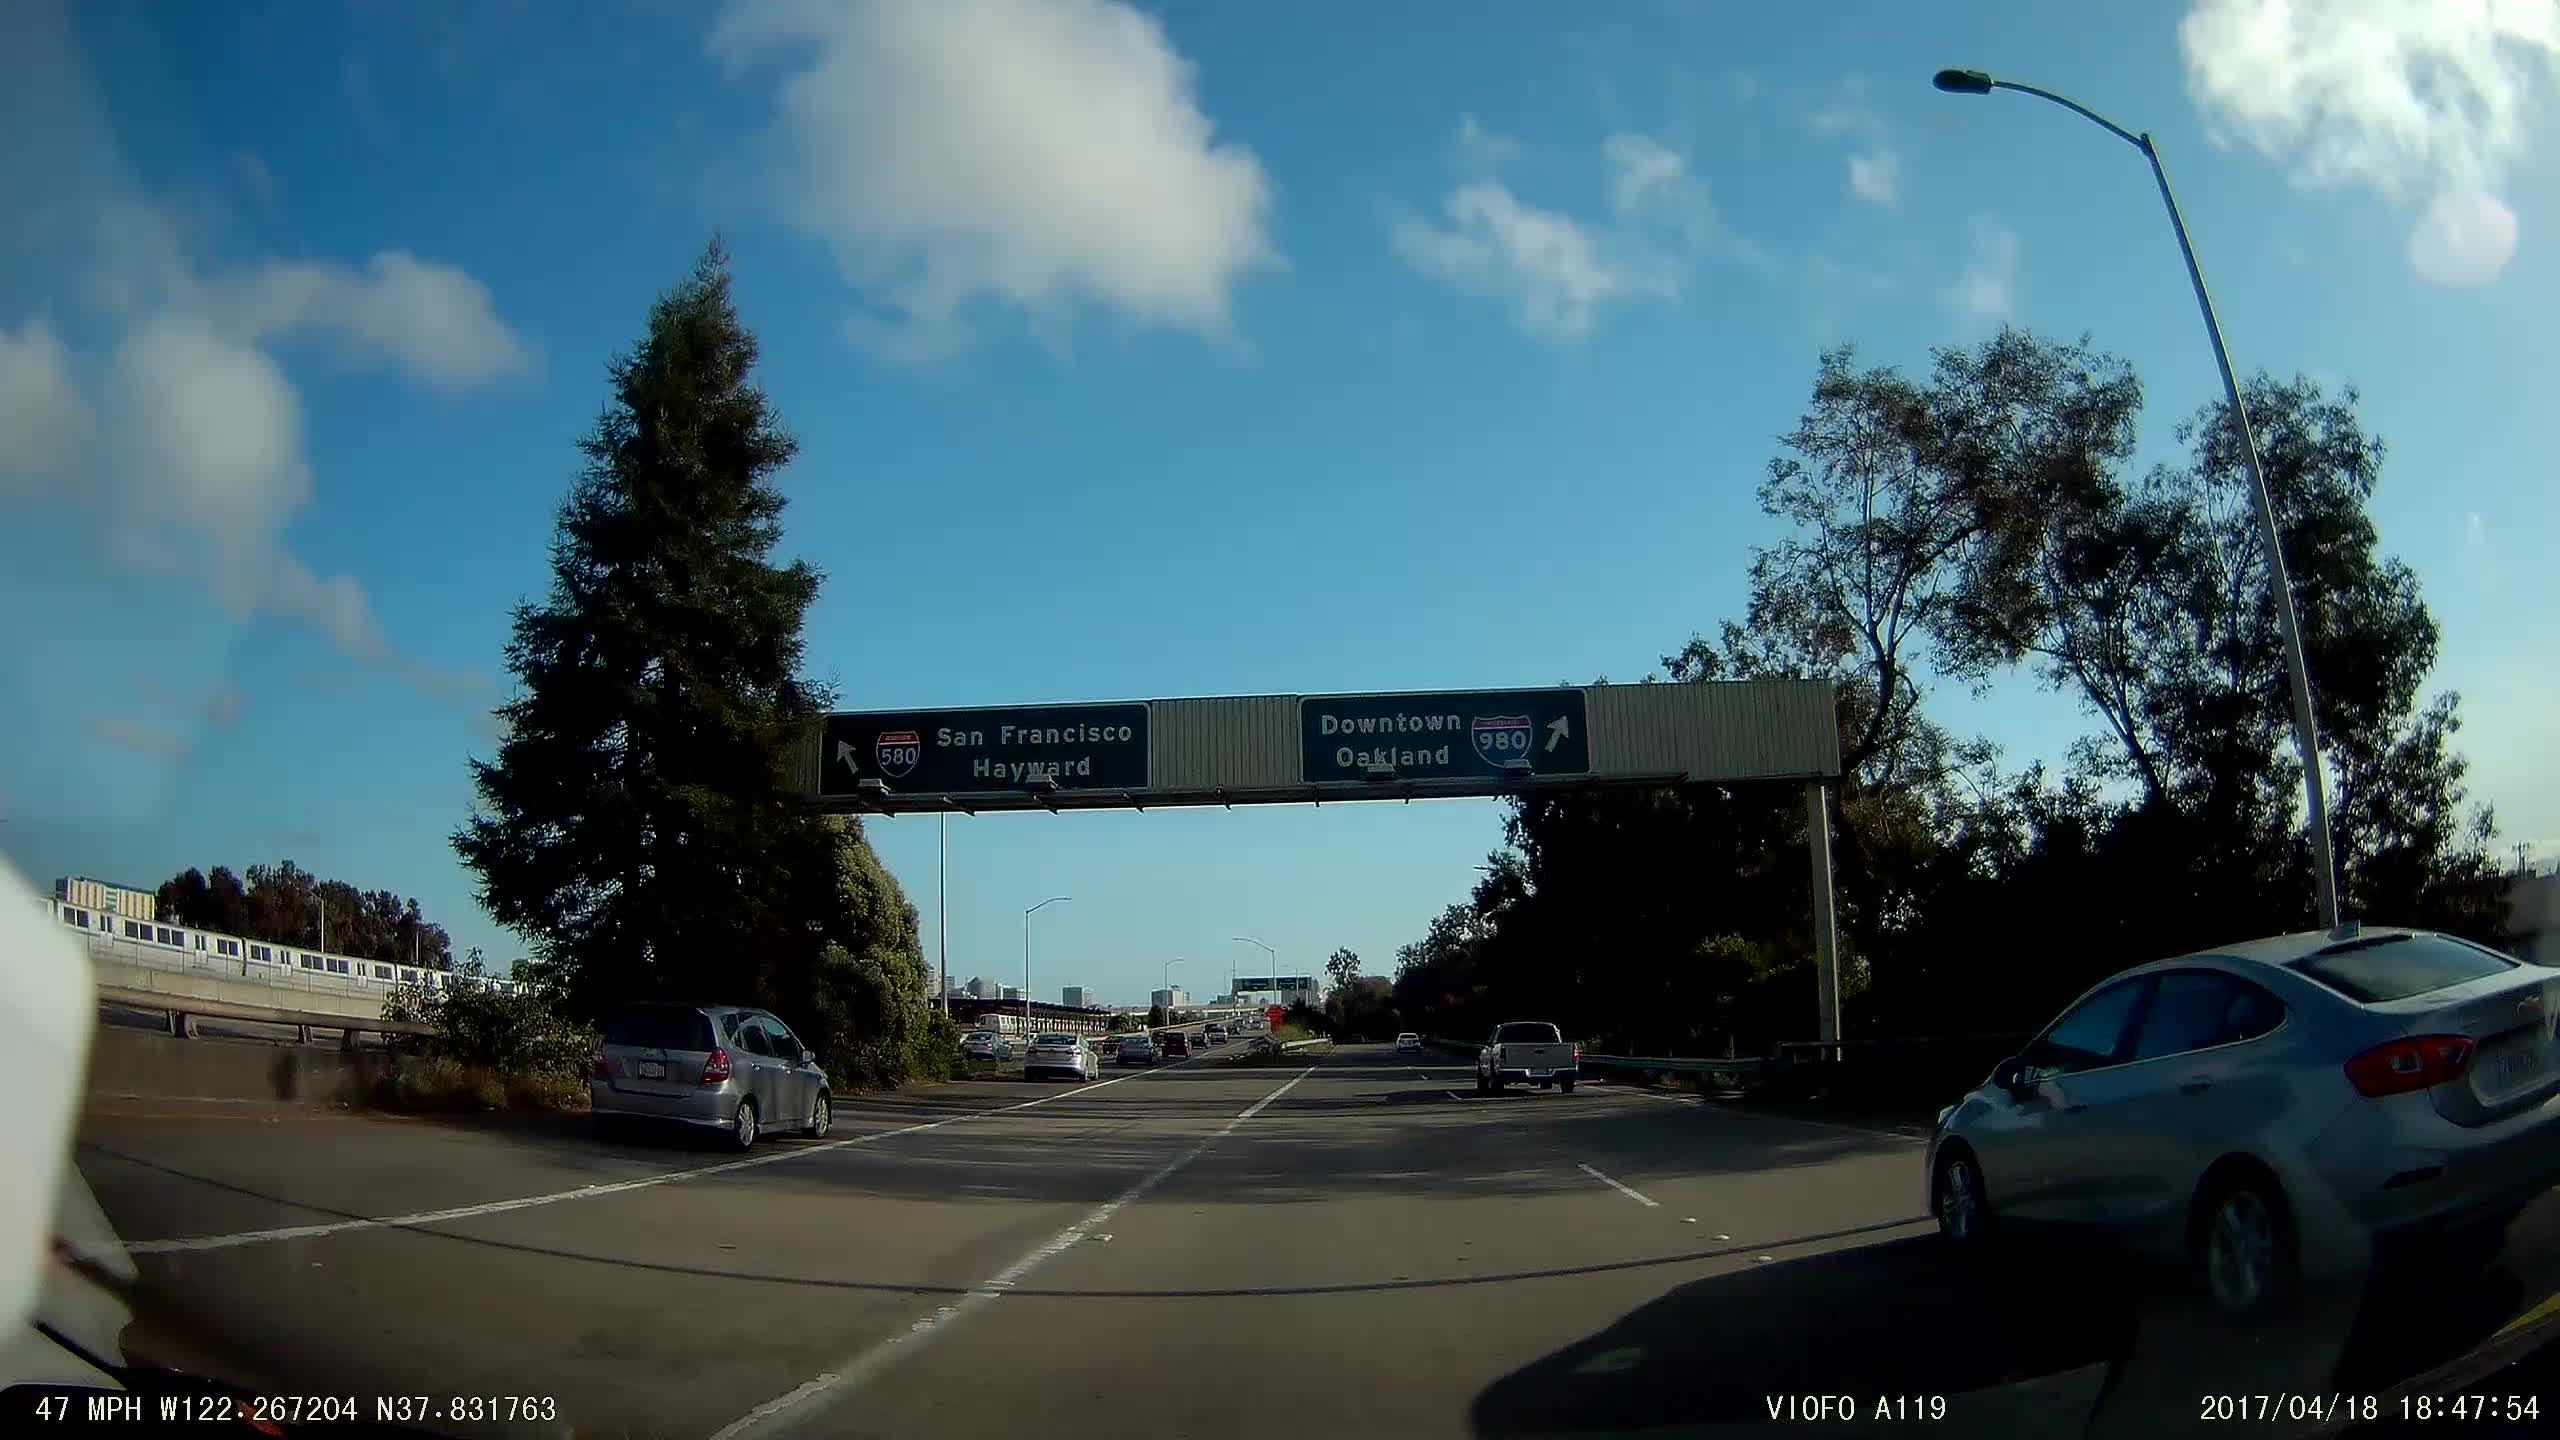 bayarea, Freeway jaywalking. Only in the bay area. GIFs